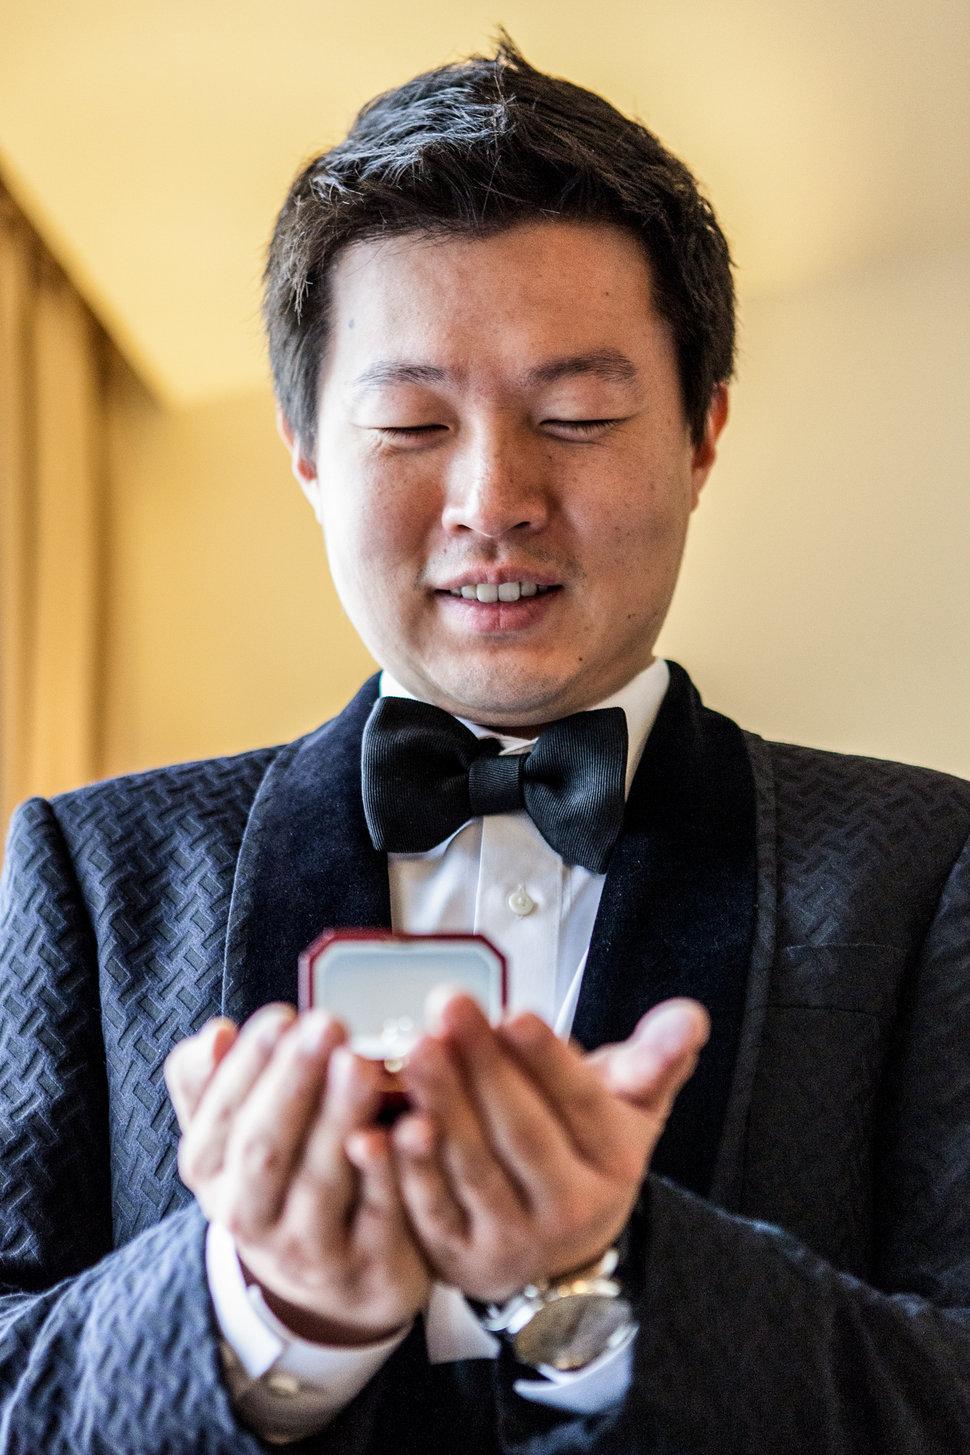 0007 - HS 婚禮攝影平面紀錄《結婚吧》